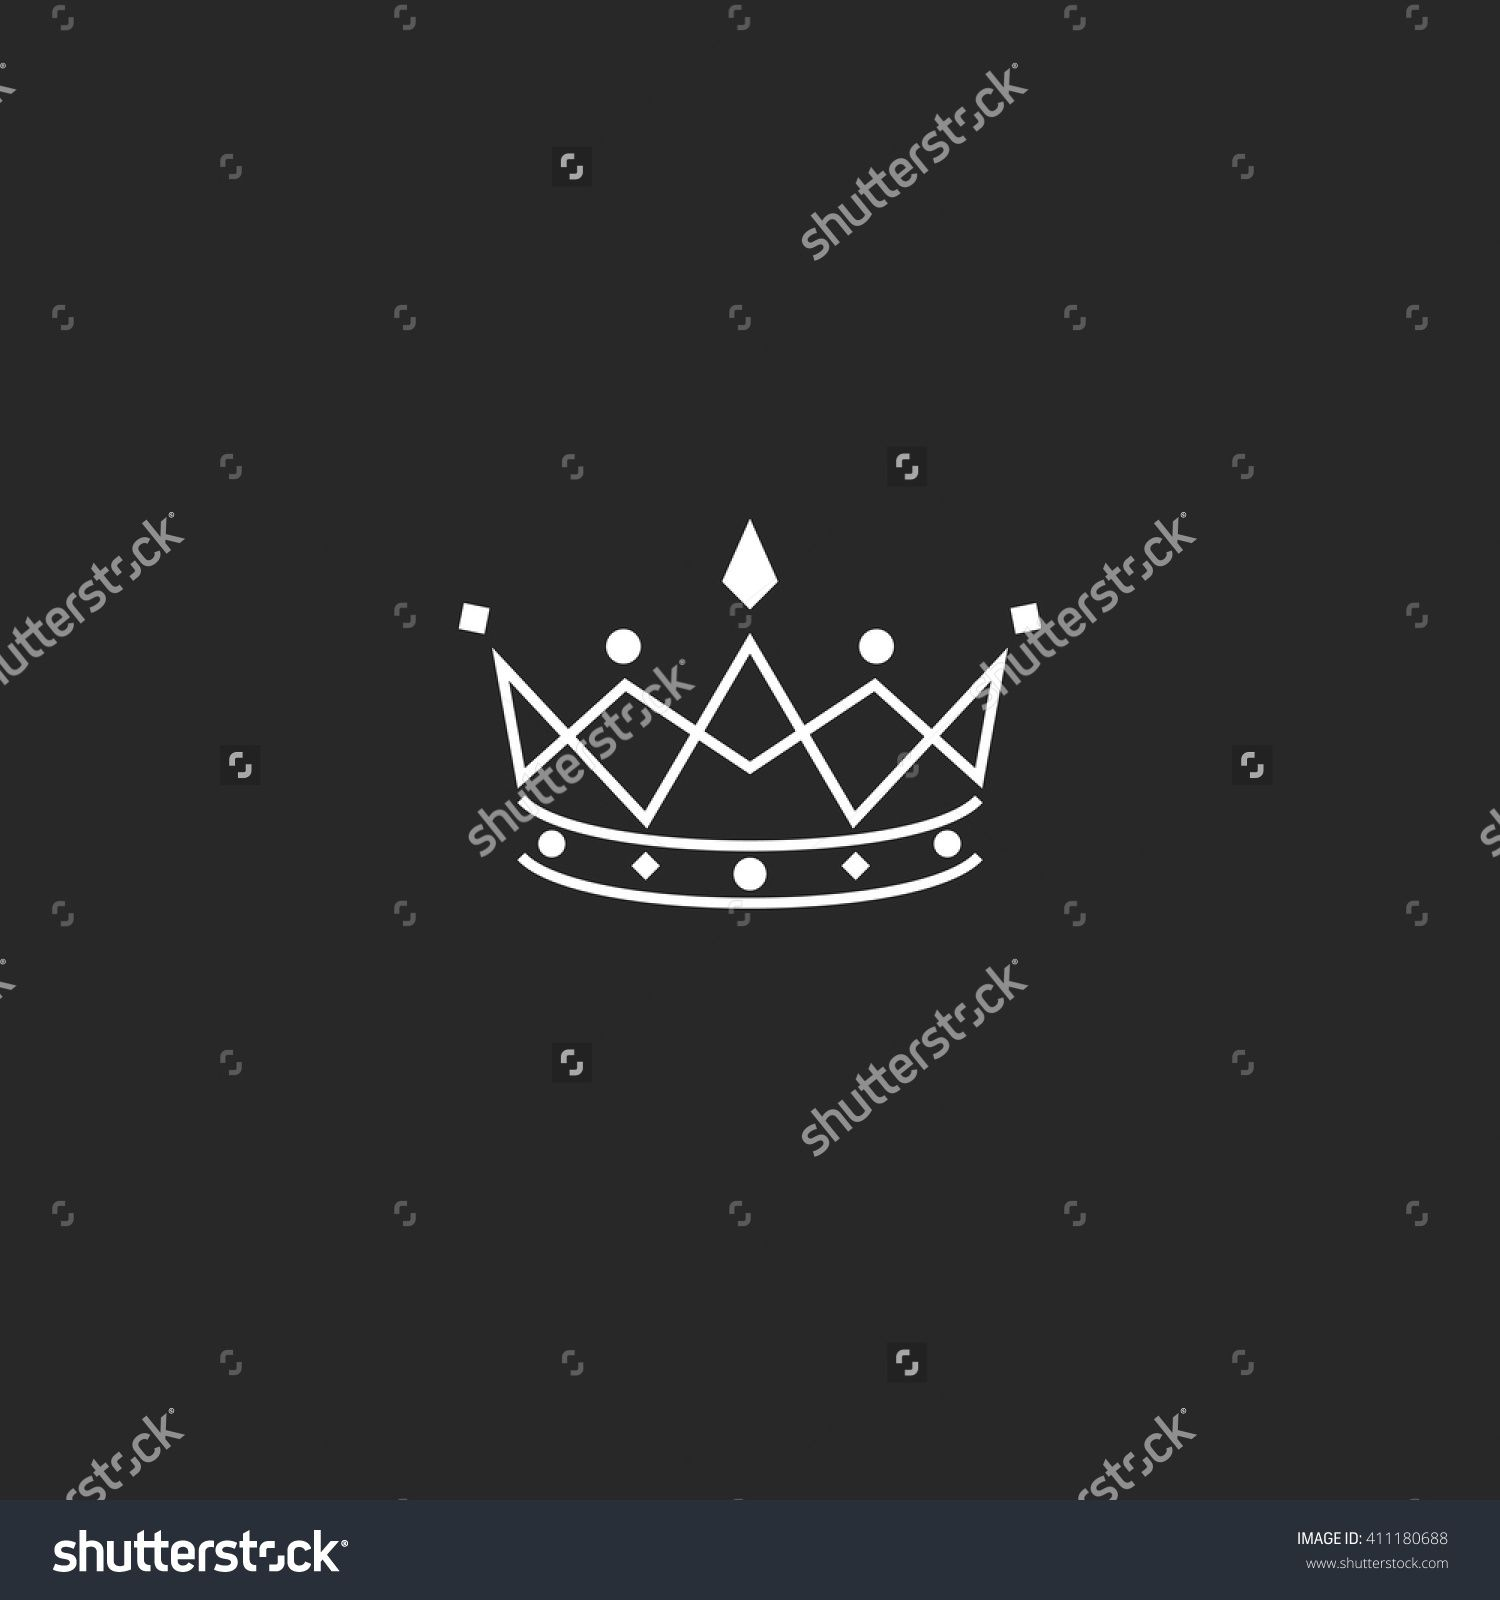 Royal symbol icon monogram crown logo beauty tiara princess royal symbol icon monogram crown logo beauty tiara princess medieval king coronation emblem buycottarizona